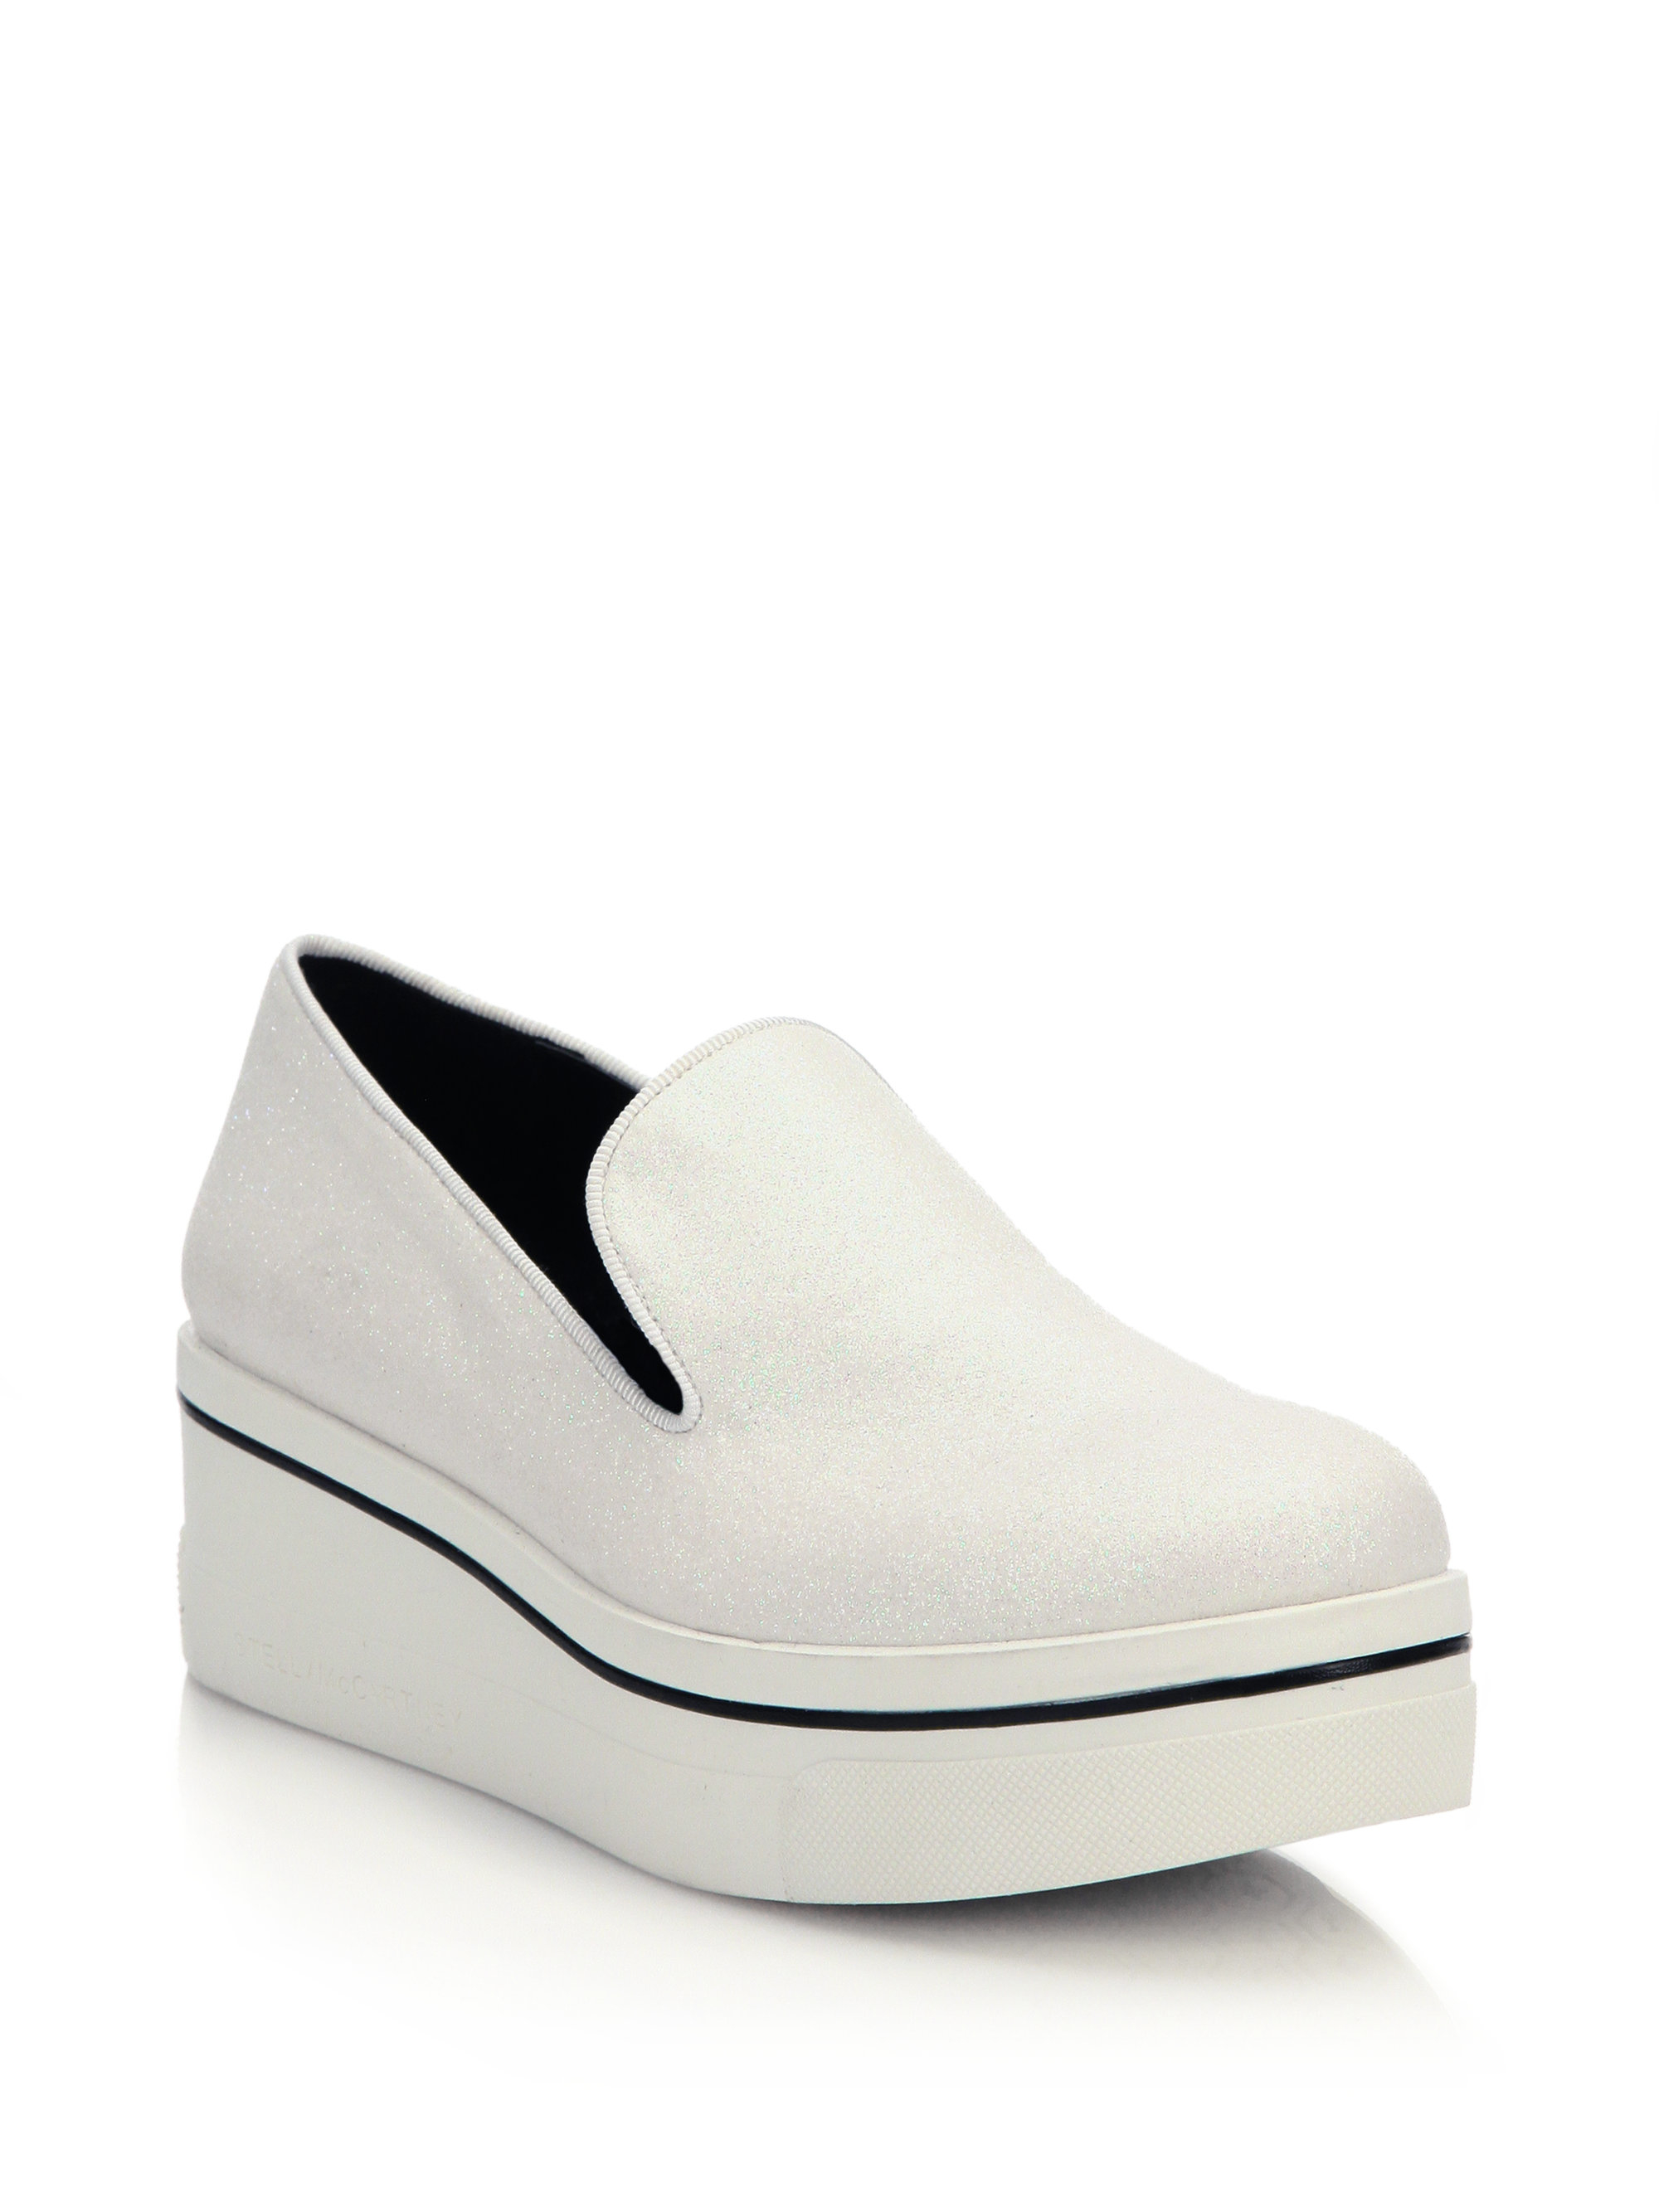 43f27d752f2 Lyst - Stella McCartney Binx Platform Loafers in White